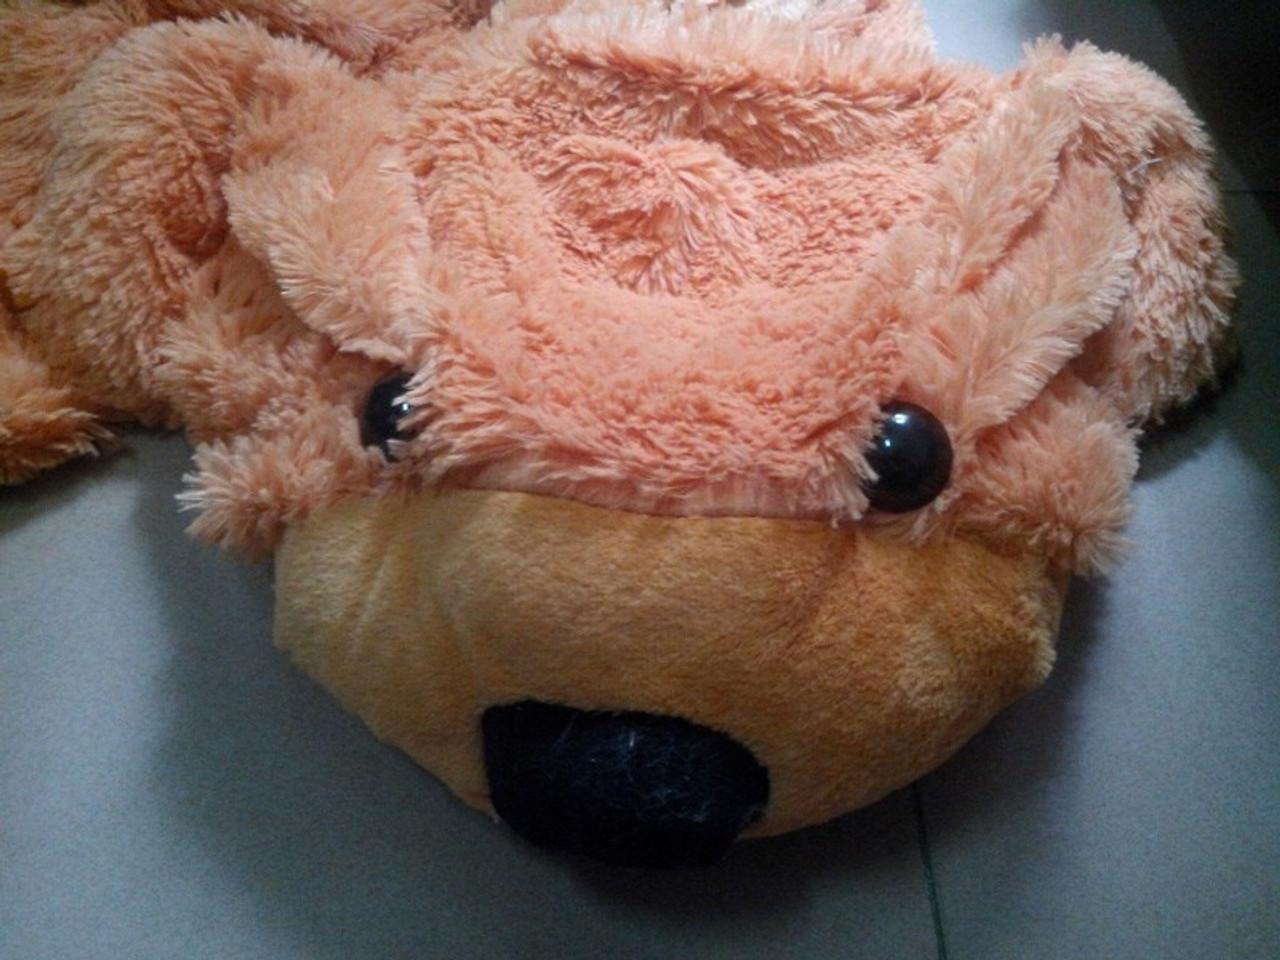 60CM to 200CM cheap giant unstuffed empty teddy bear bearskin coat soft big